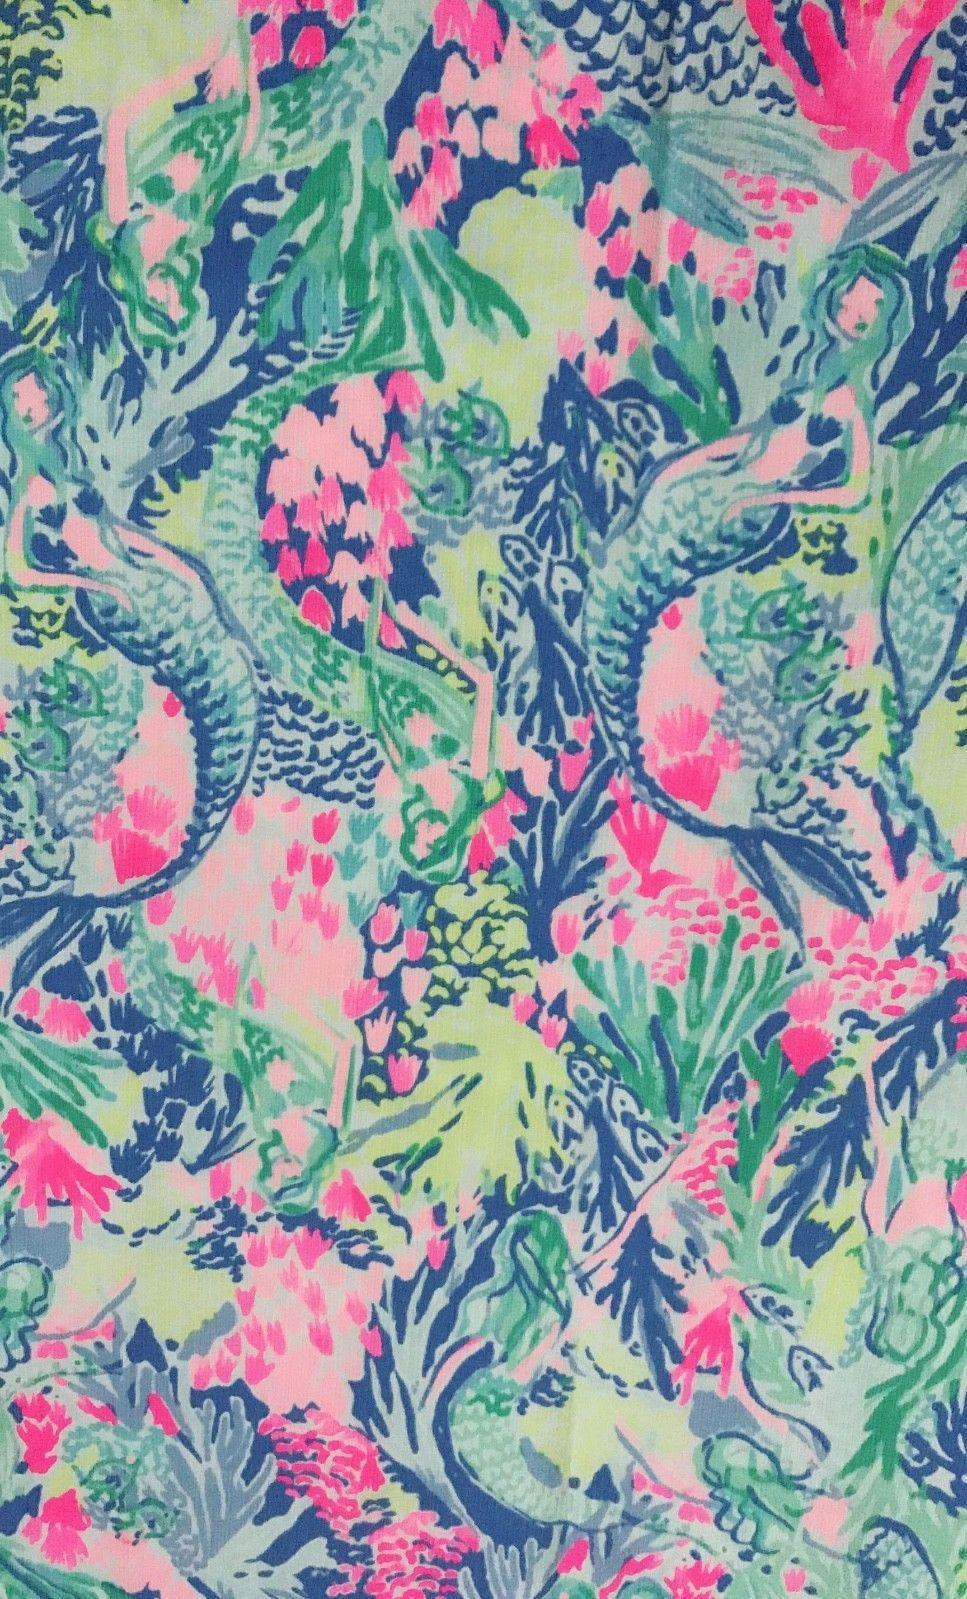 f3211e633d249d Lilly Pulitzer Mermaid Dobby Cotton Fabric Multi Mermaids Cove 1 Yard 36